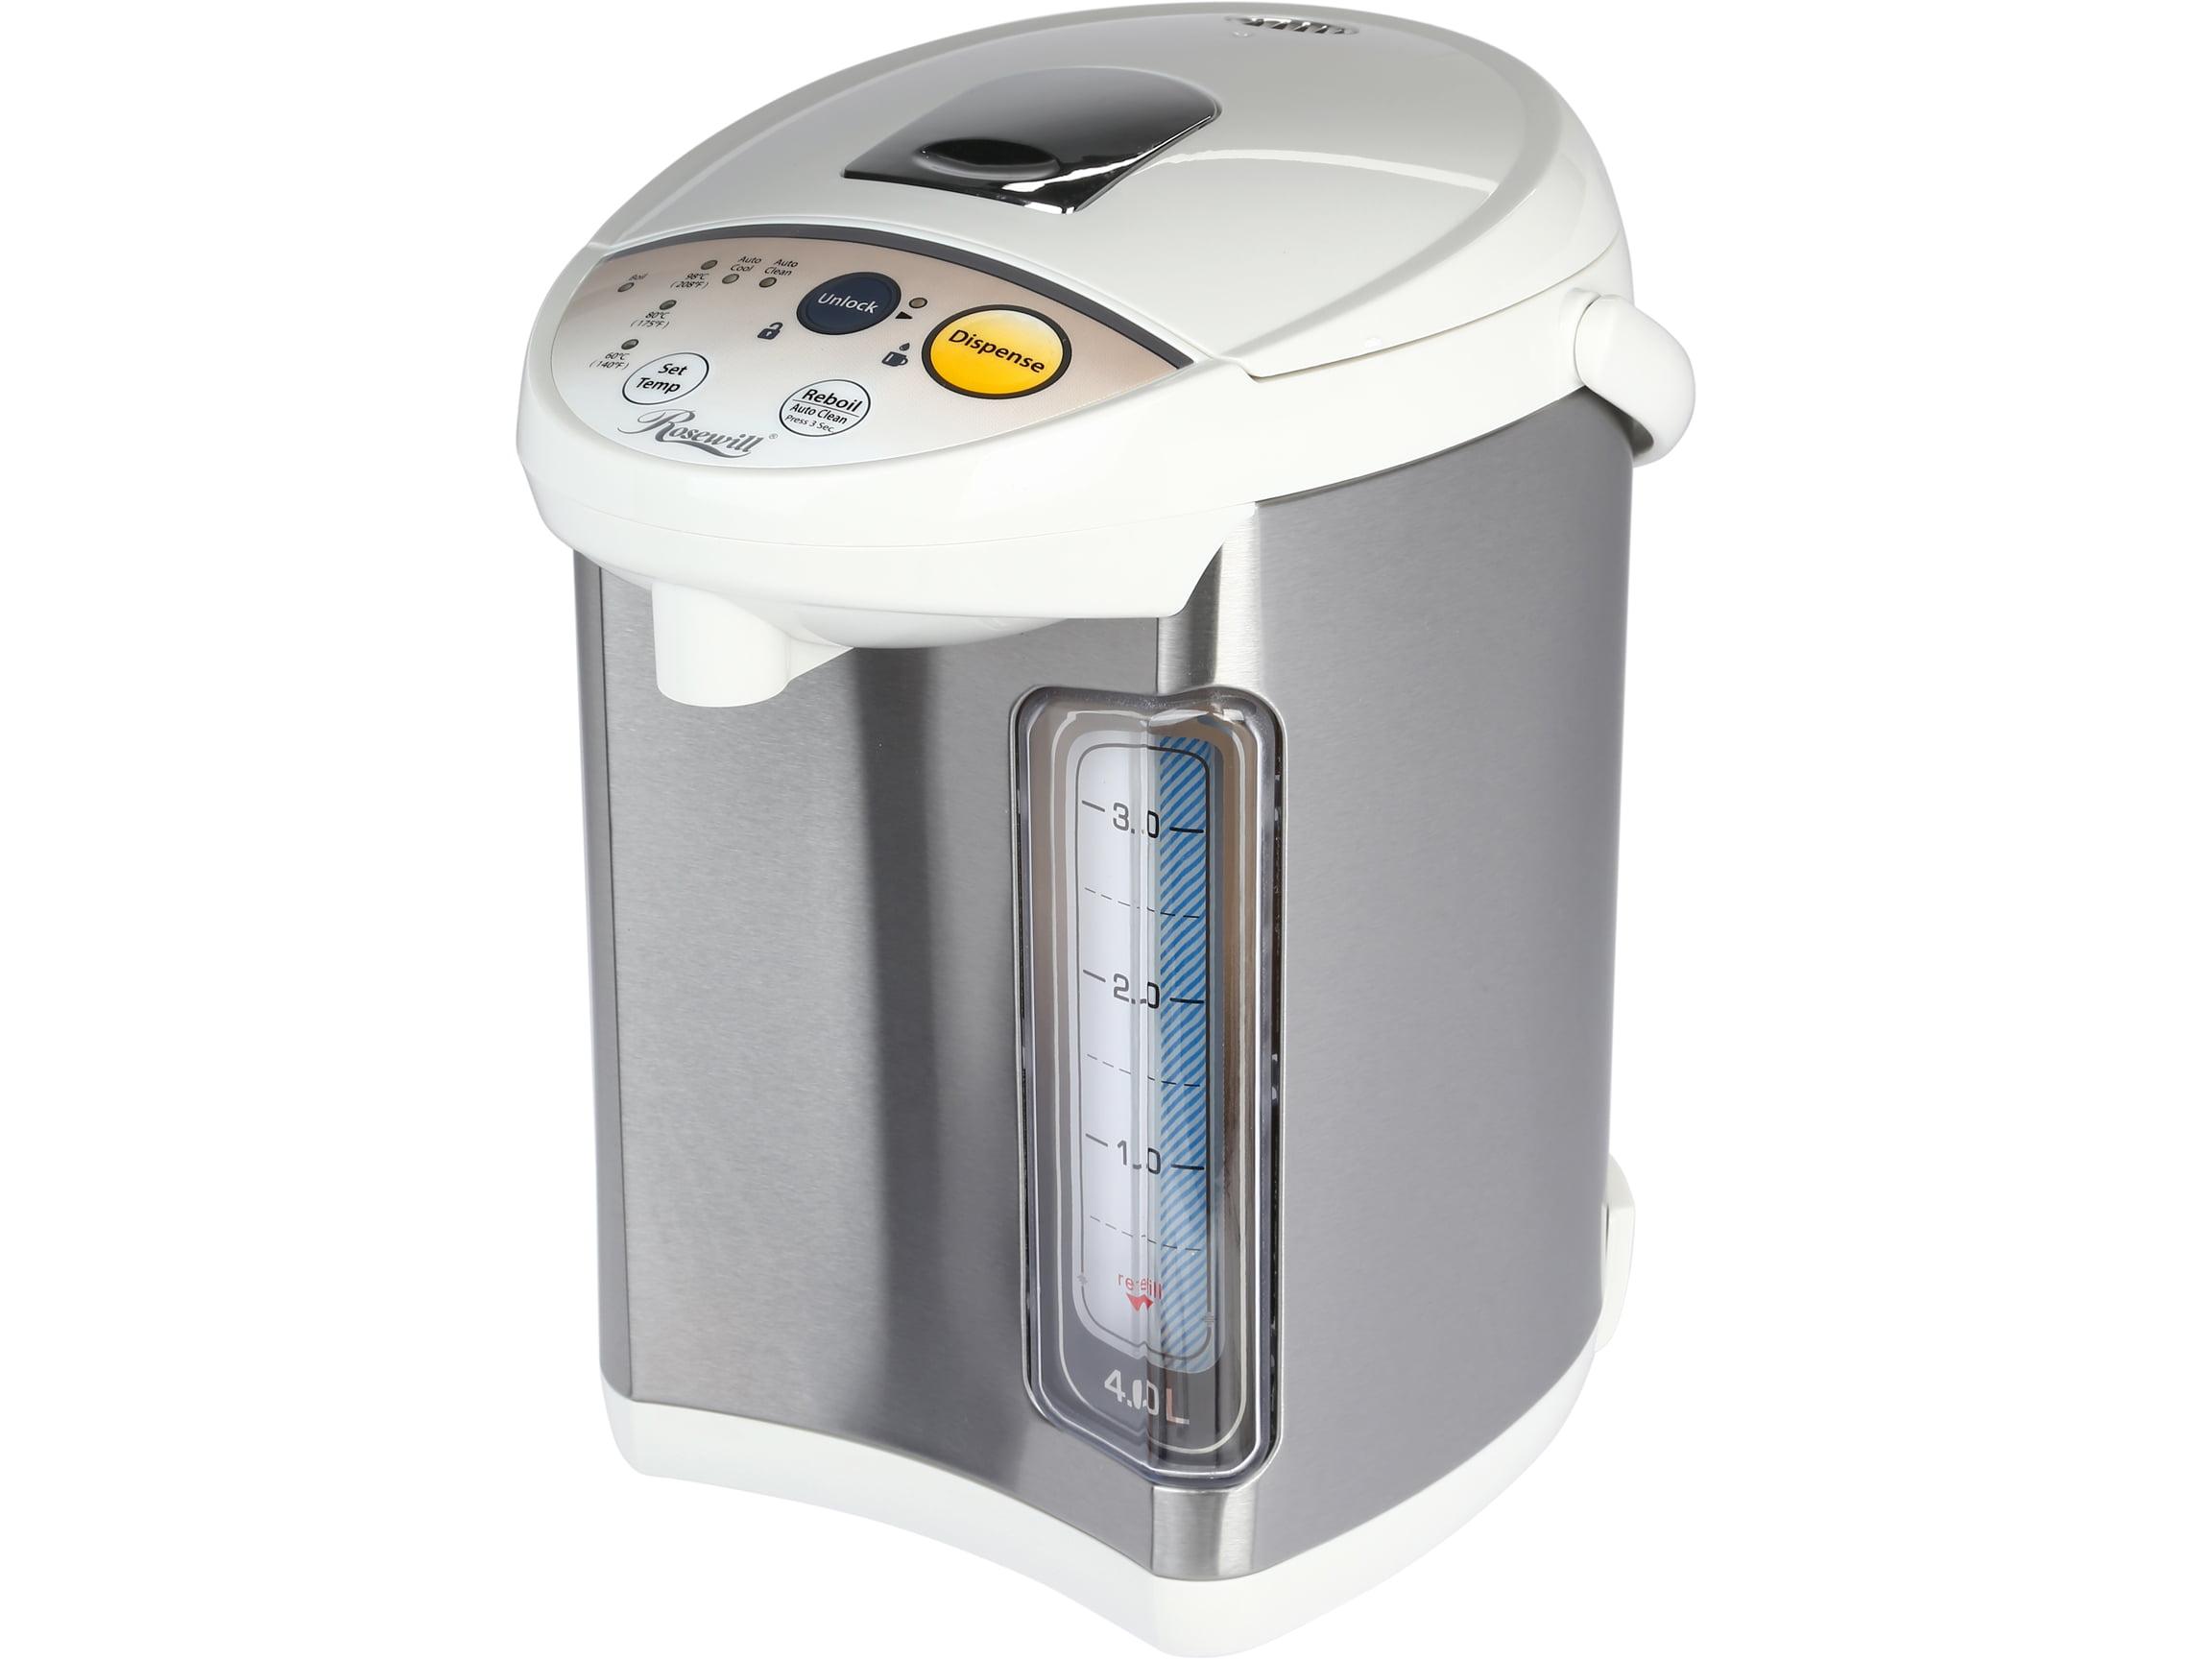 Rosewill 4 0 Liter Dual Electric Hot Water Dispenser Boiler And Warmer Rhap 16001